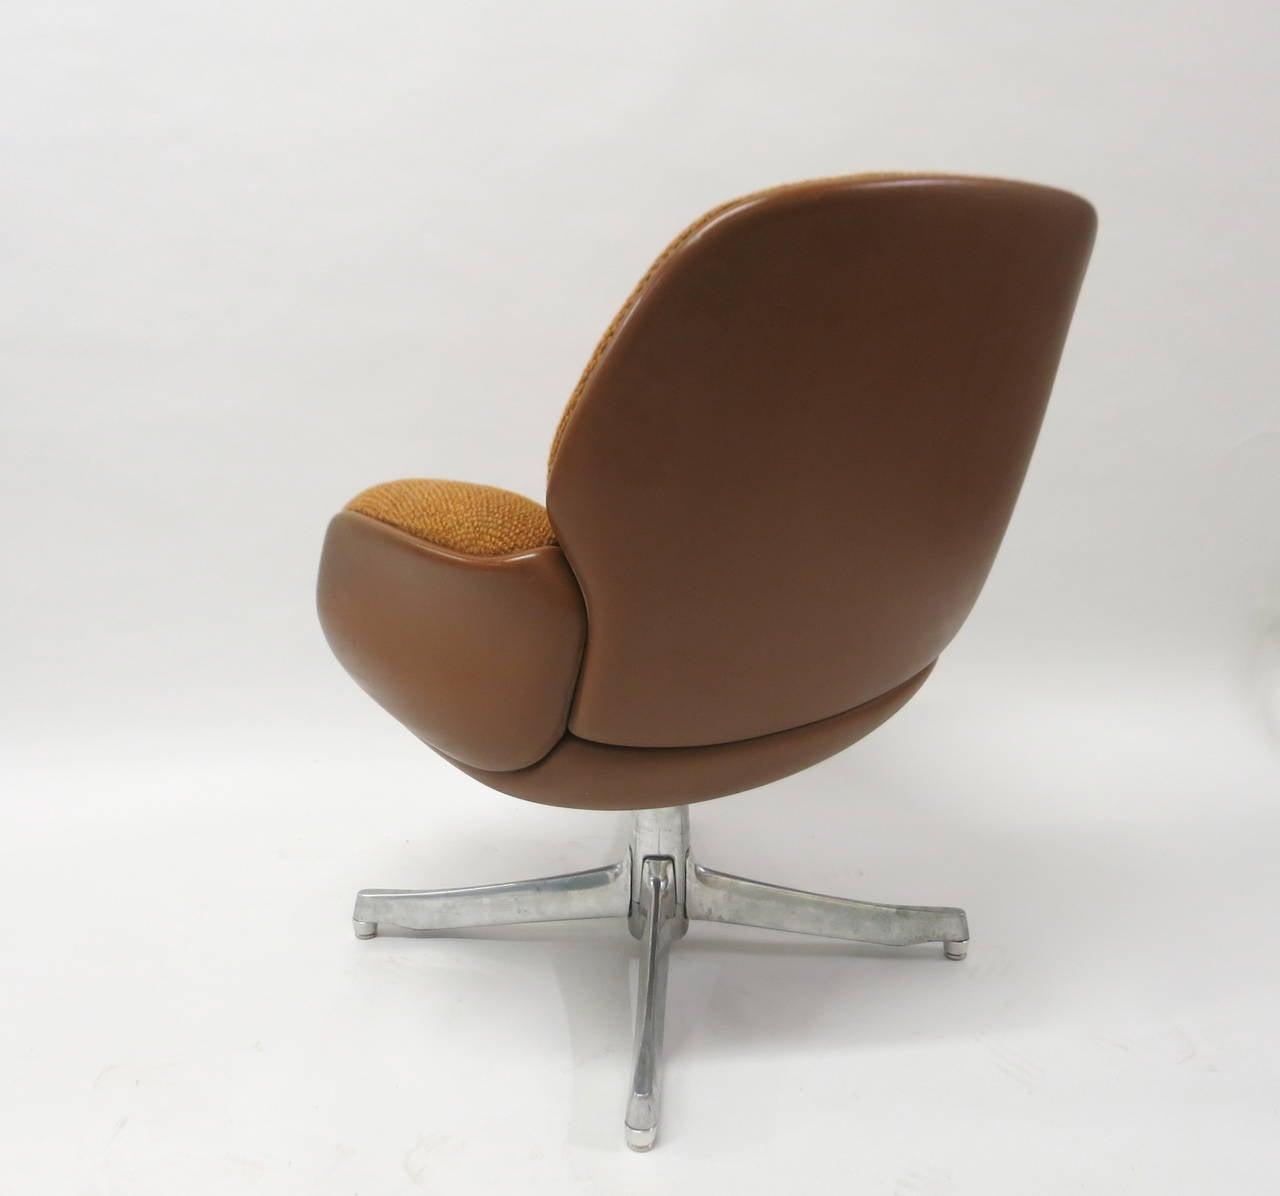 steelcase sofa platner helmond sport telstar sofascore pair of chairs by warren for usa circa